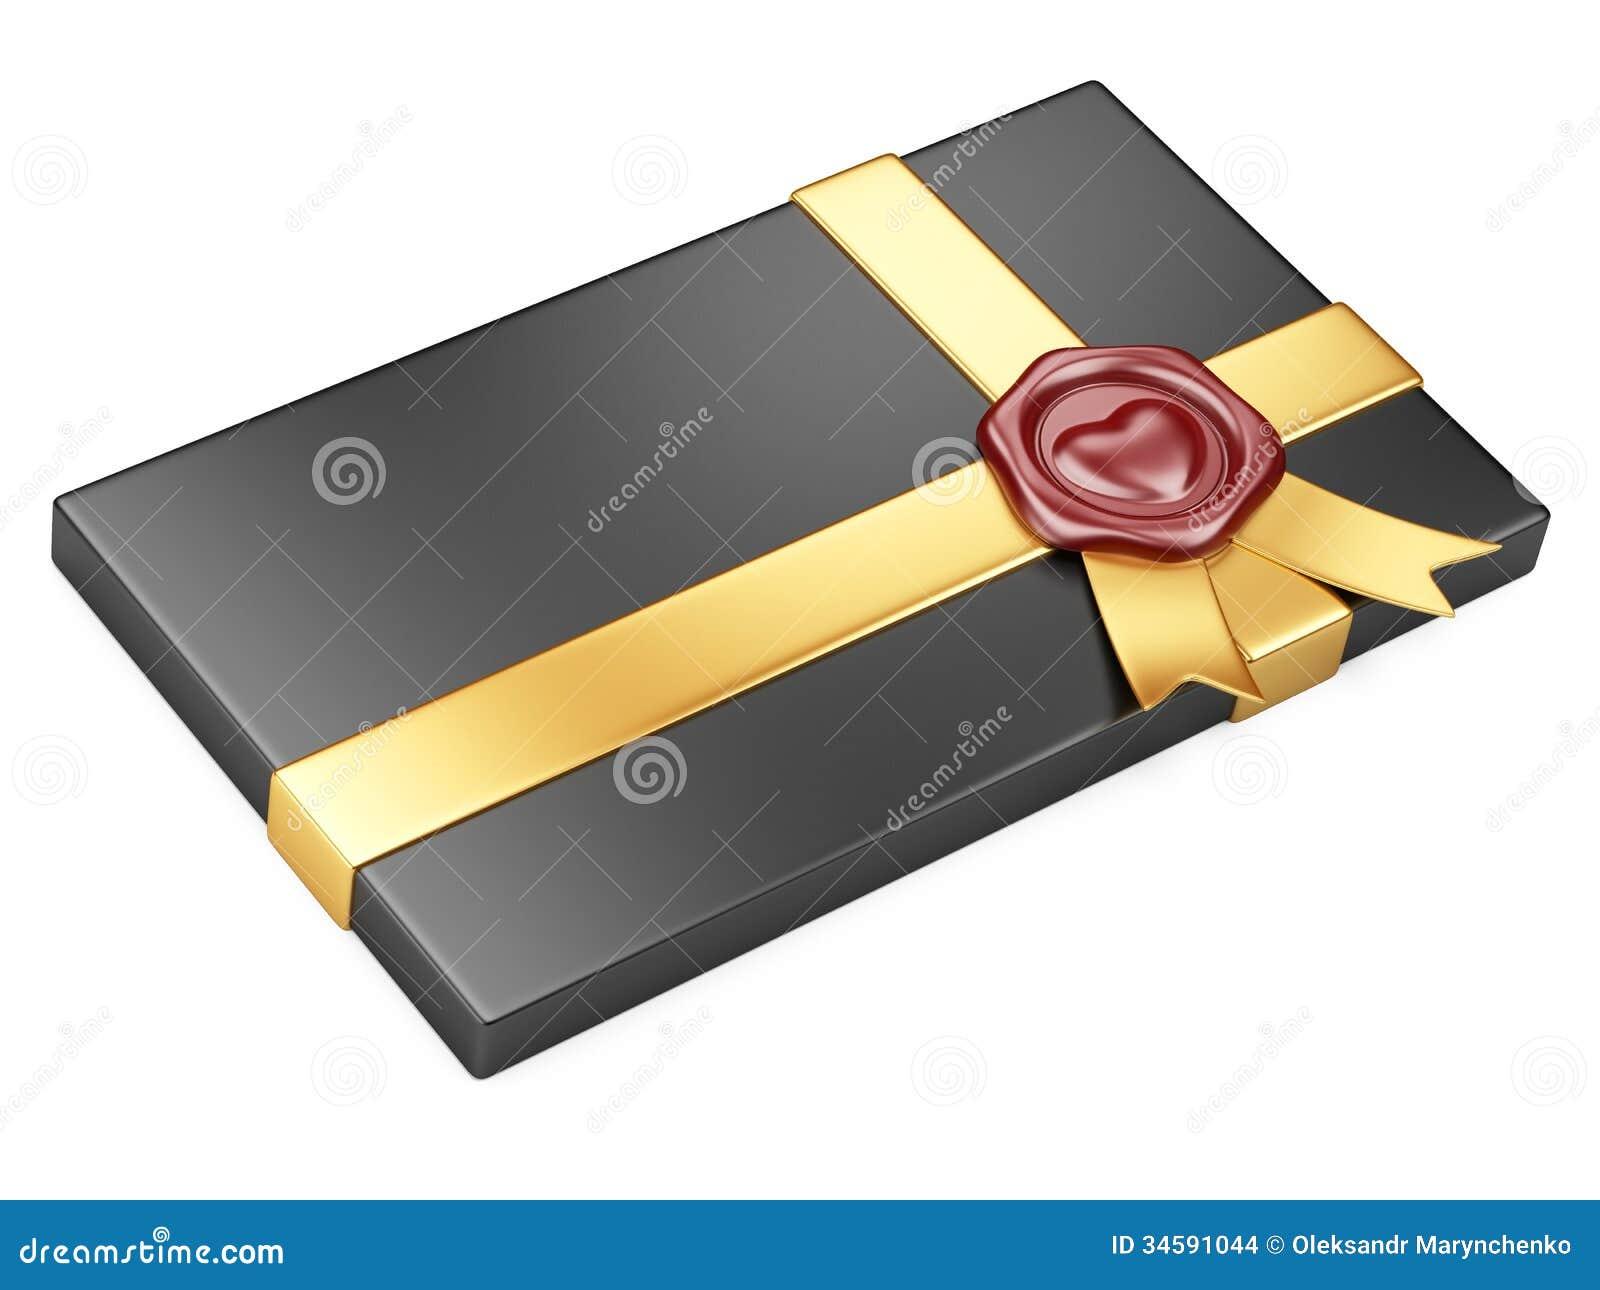 black box with sealing wax and gold ribbon stock illustration